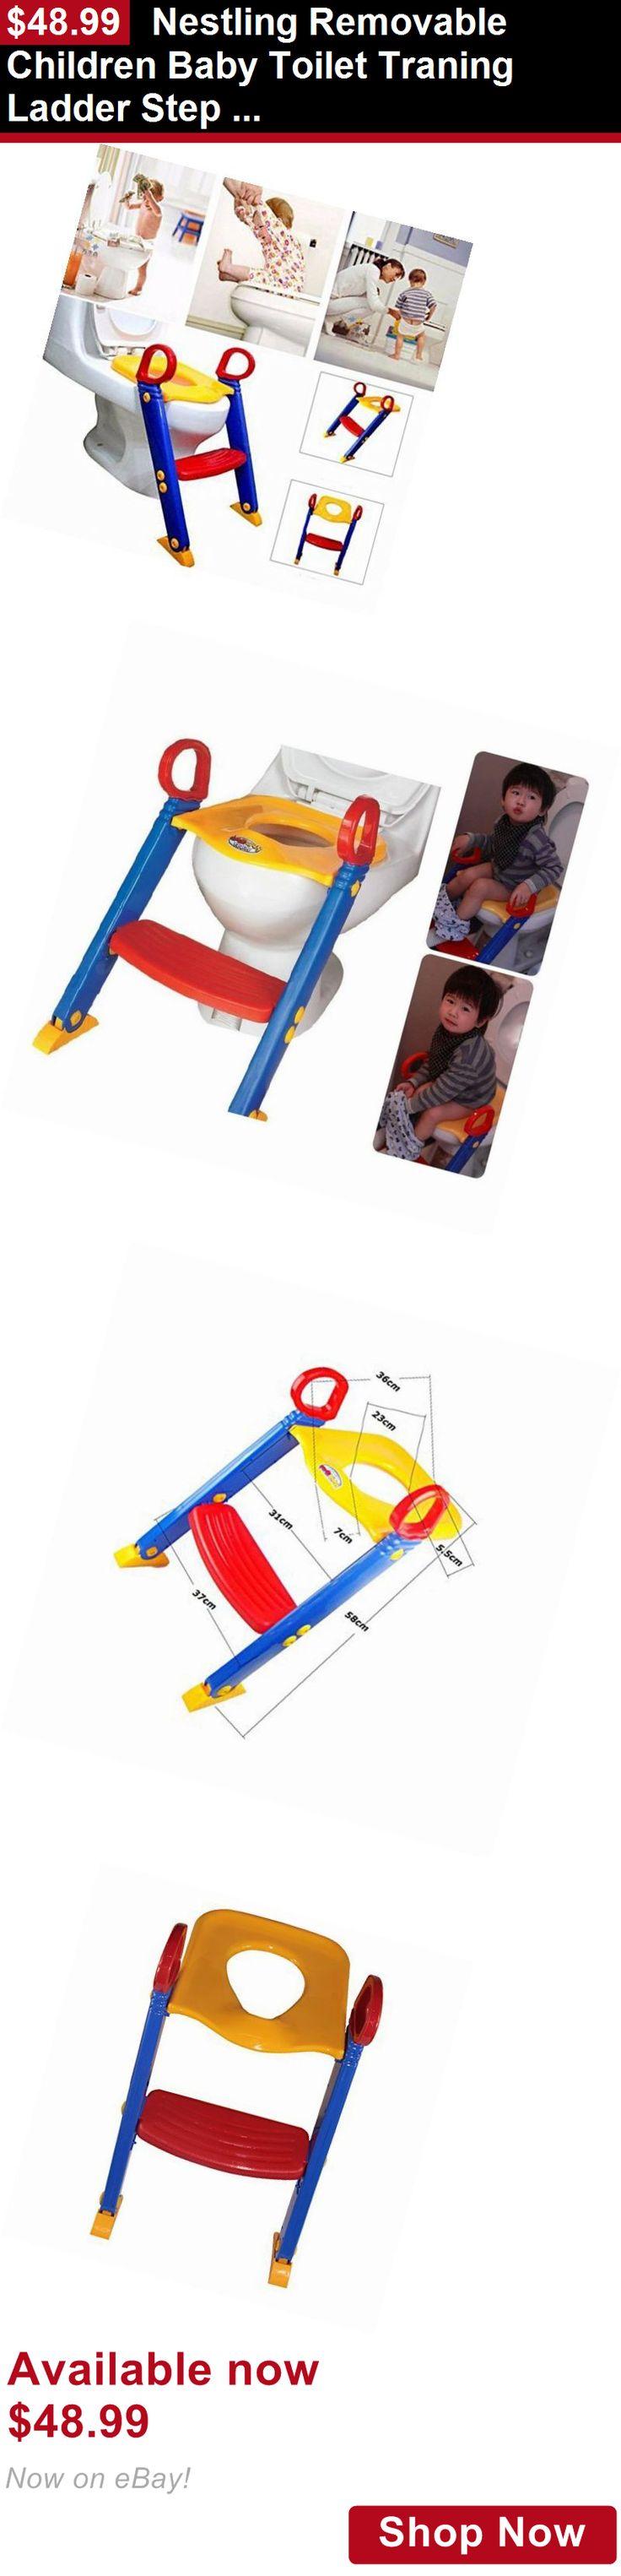 Potty Training: Nestling Removable Children Baby Toilet Traning Ladder Step Kids Toilet Potty Se BUY IT NOW ONLY: $48.99